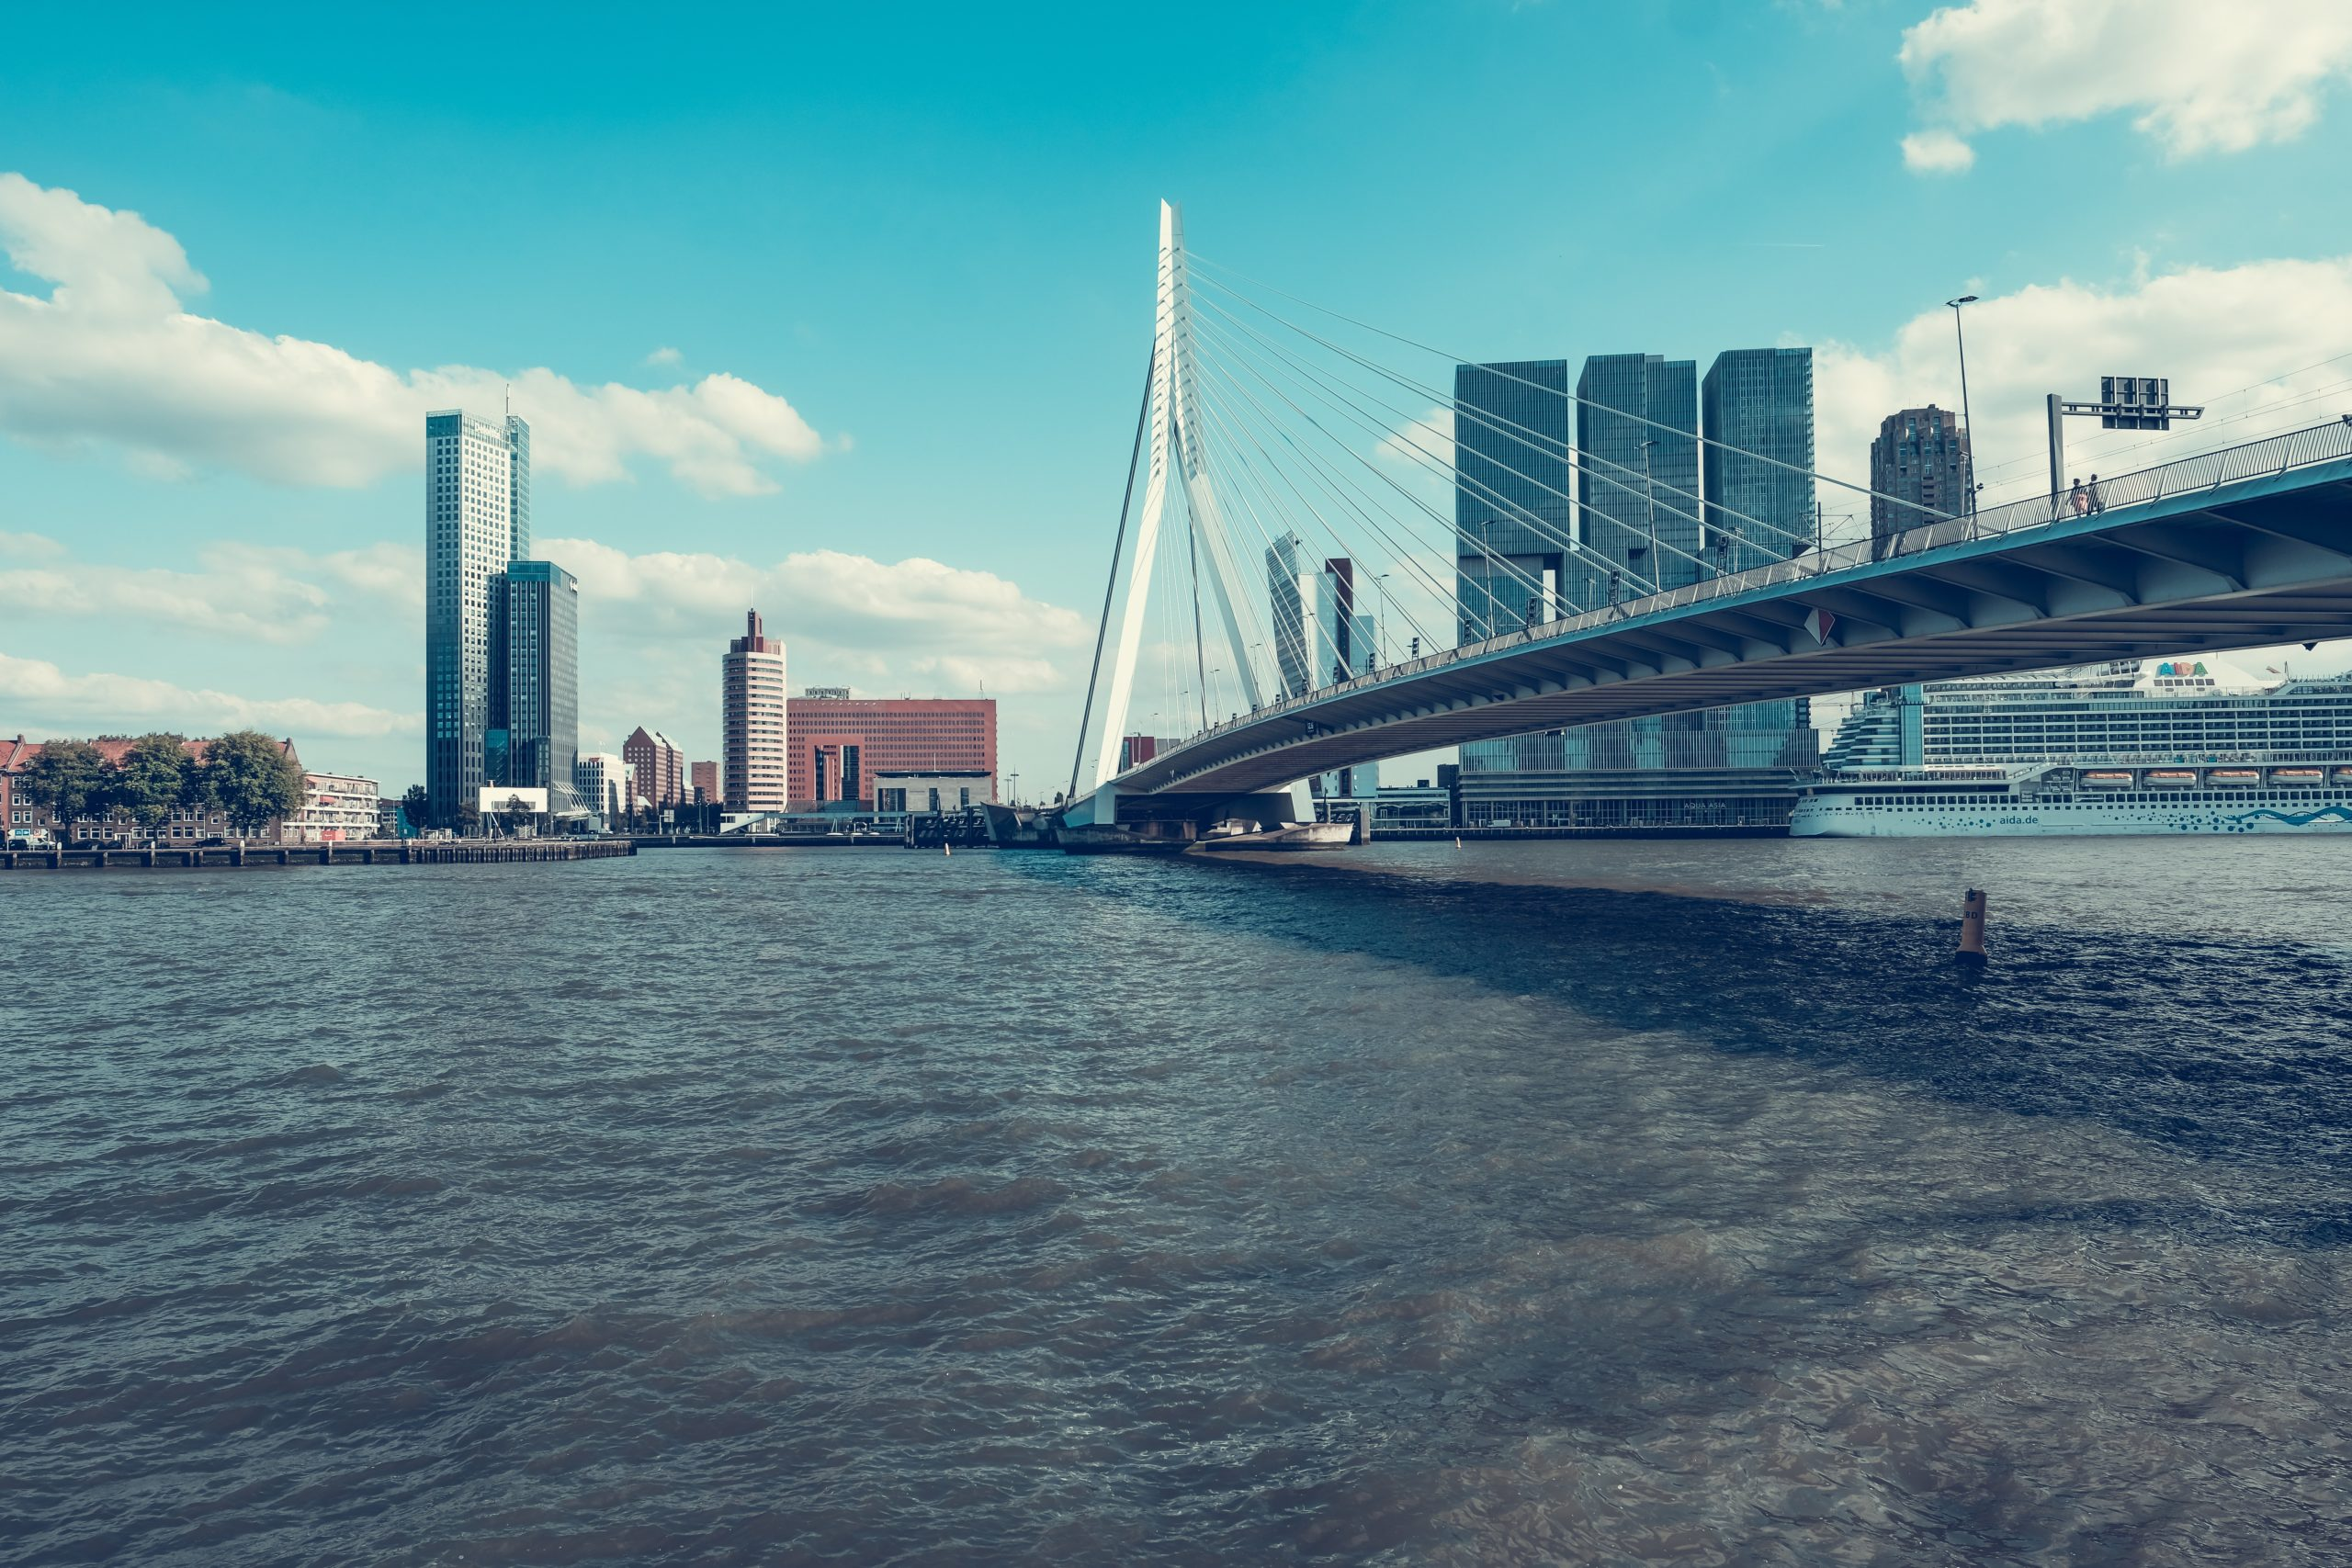 Rotterdam wijzigt parkeertarieven per 1 januari 2020